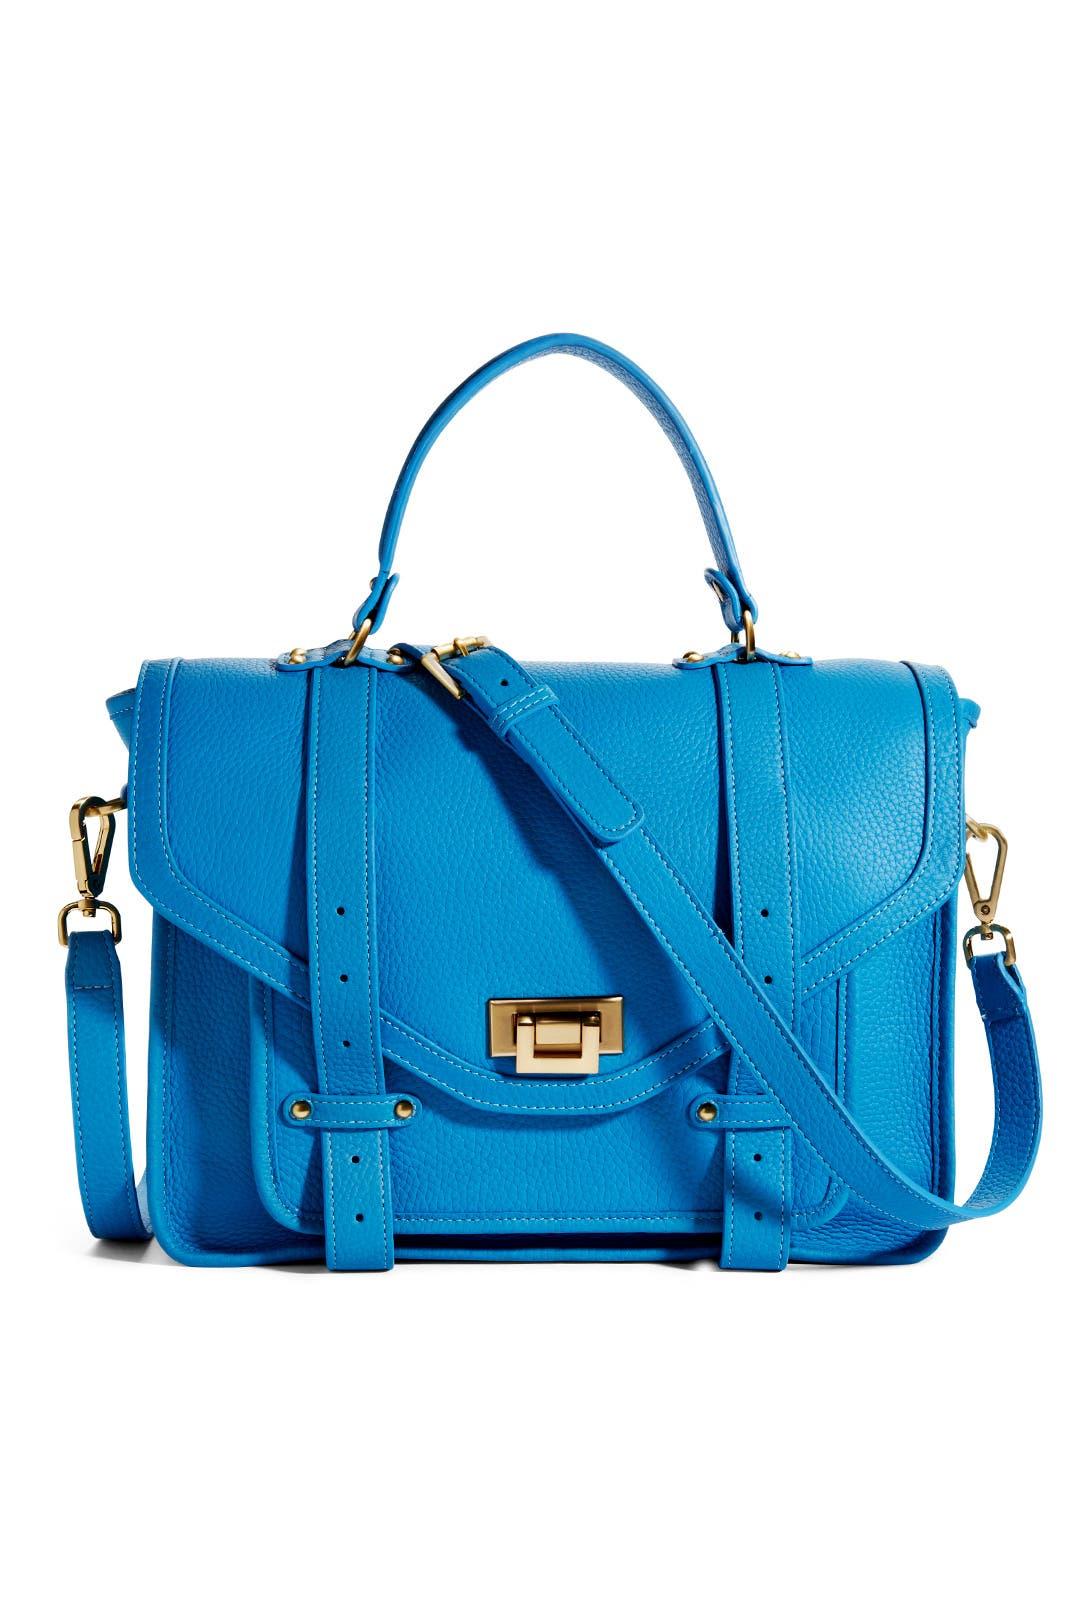 Blue Hayden Satchel by Gigi New York